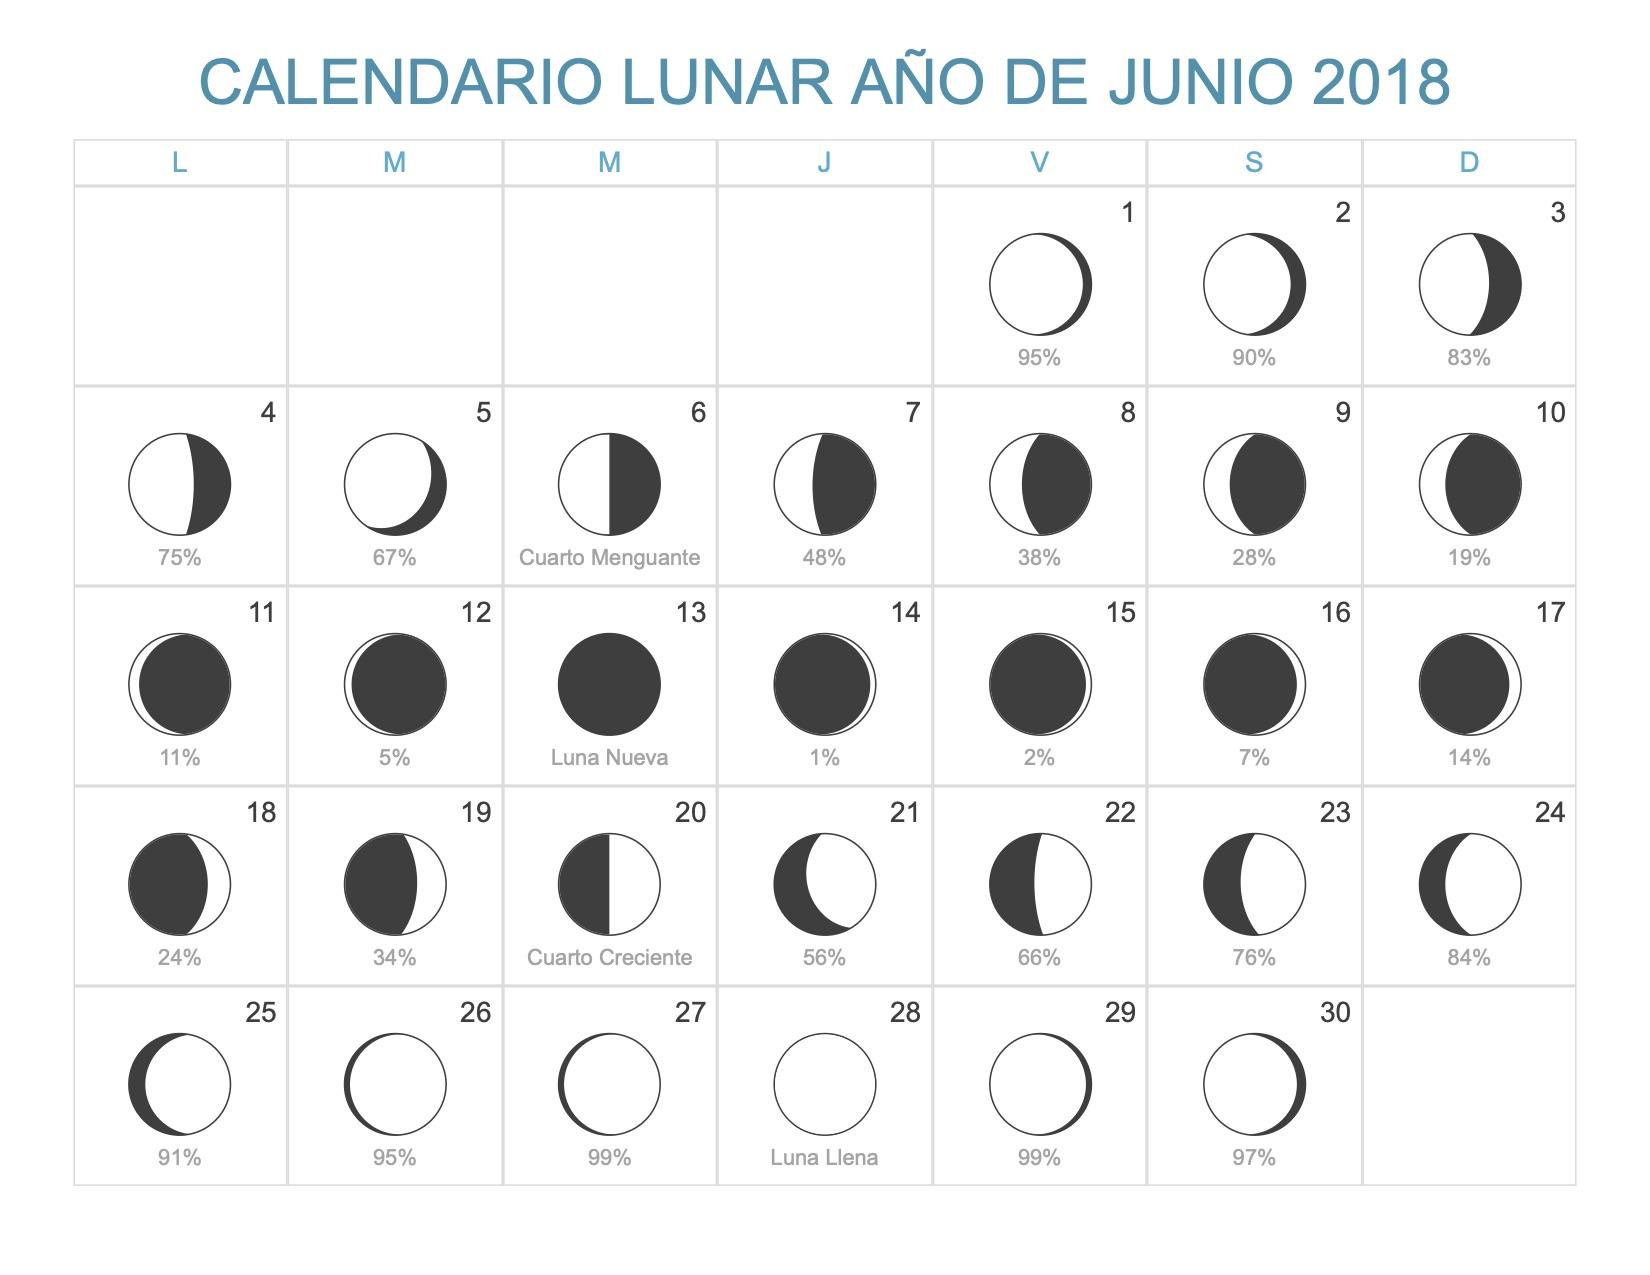 Calendario lunar junio 2018 for Calendario lunar mayo